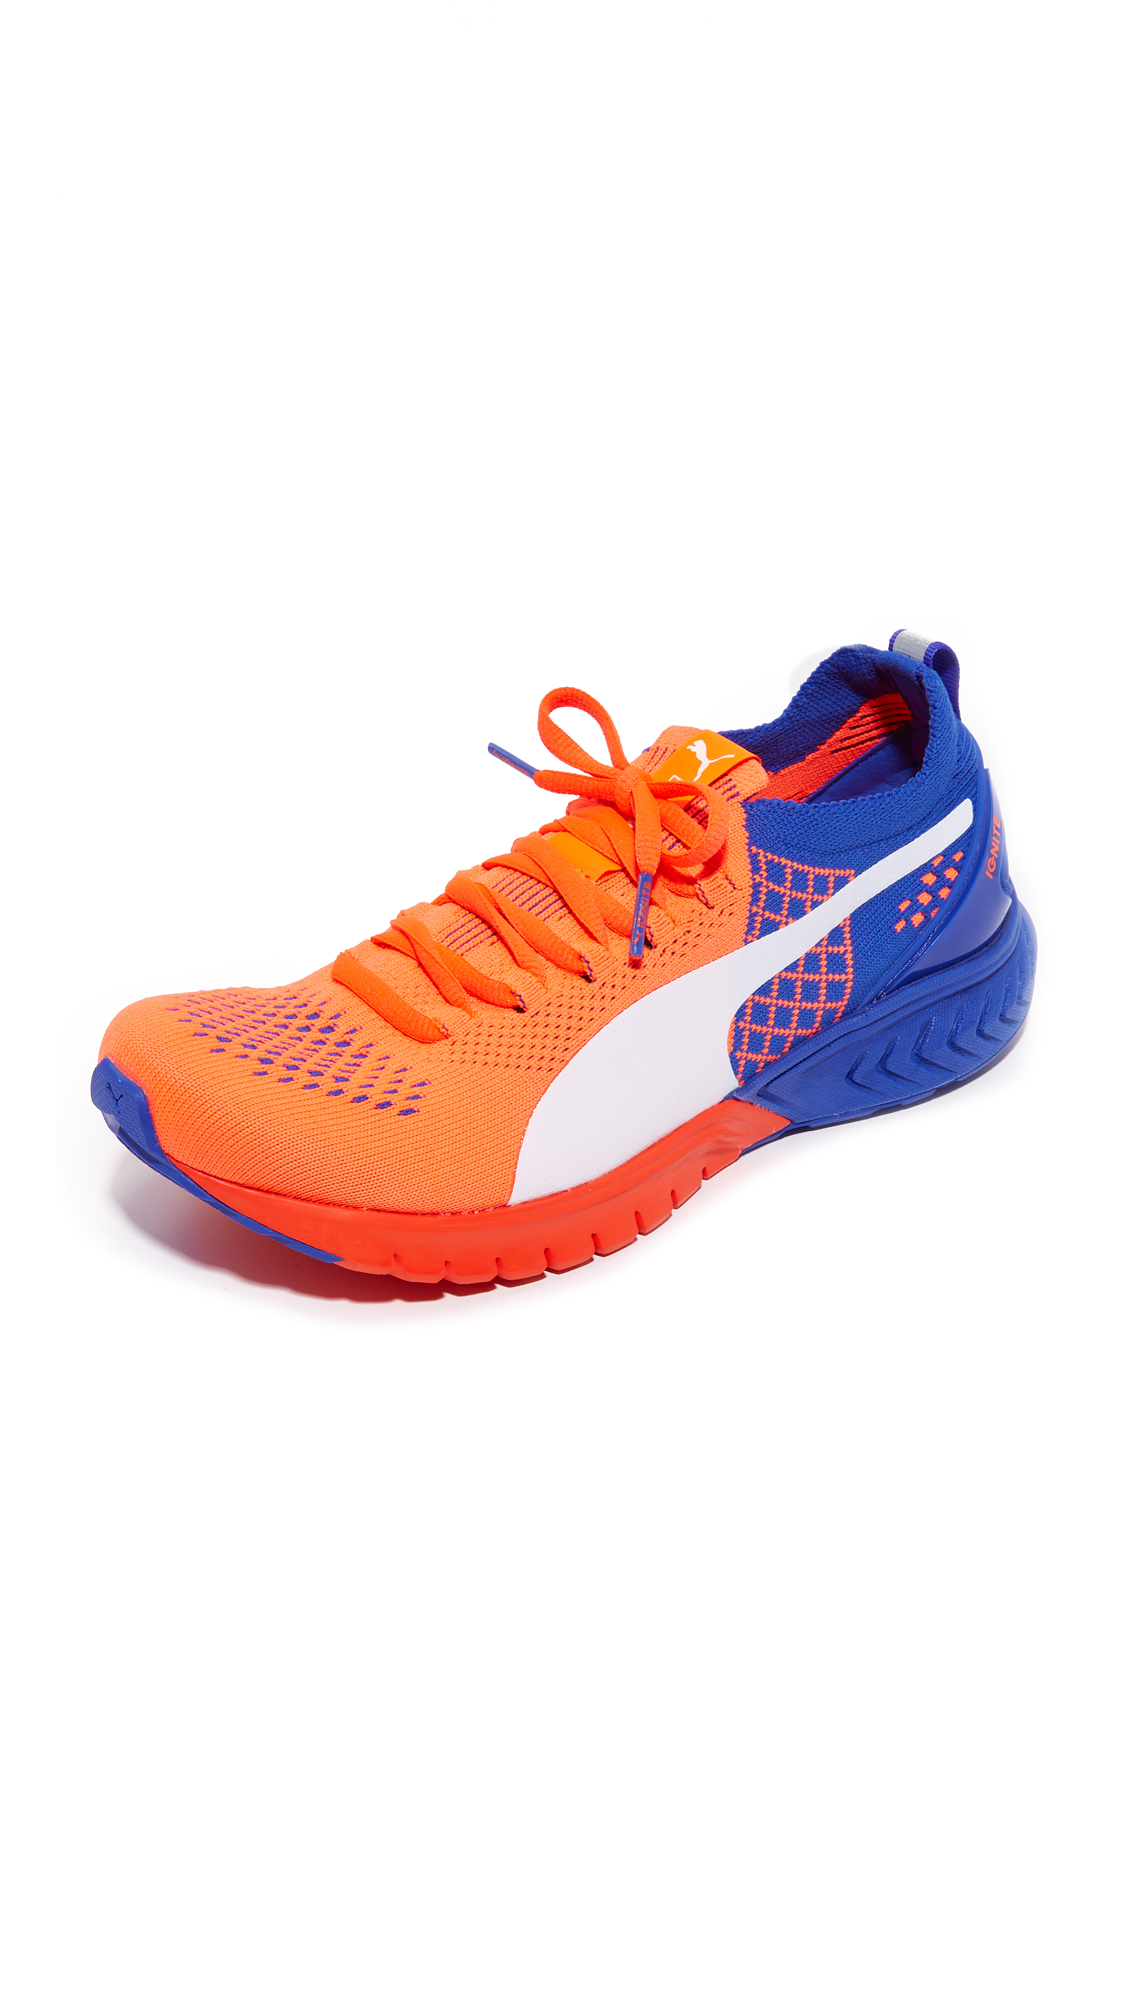 puma female puma ignite dual evoknit sneakers red blastroyal bluewhite